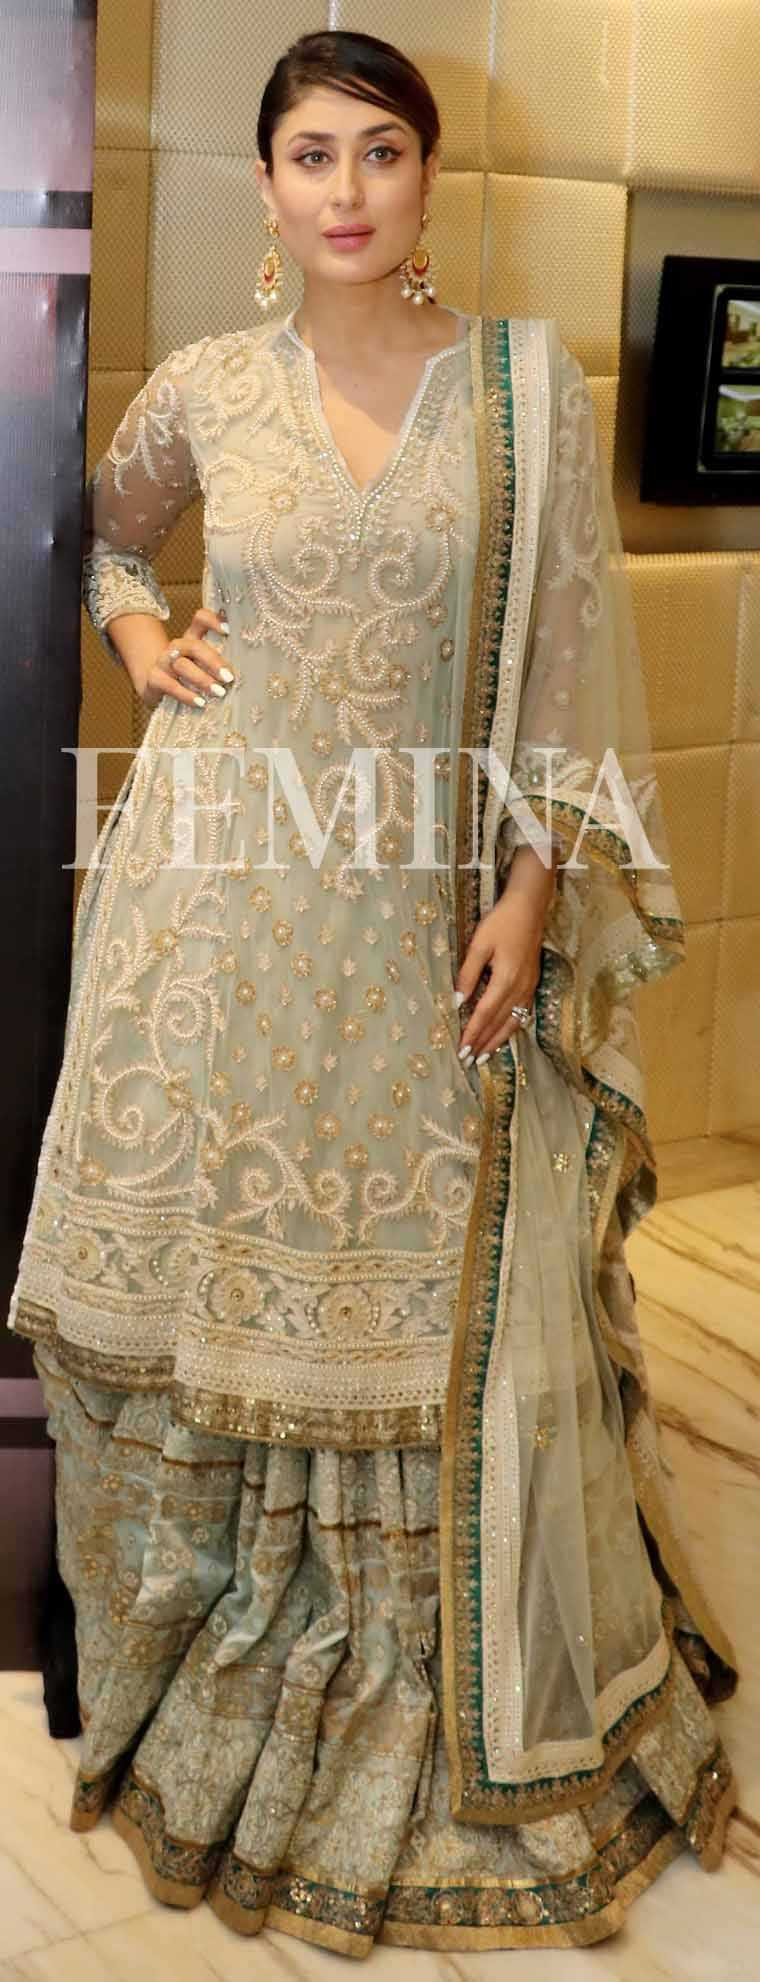 Kareena Kapoor Khan: Cool mint  Bebo looks ethereal in her embellished Tarun Tahiliani ensemble.